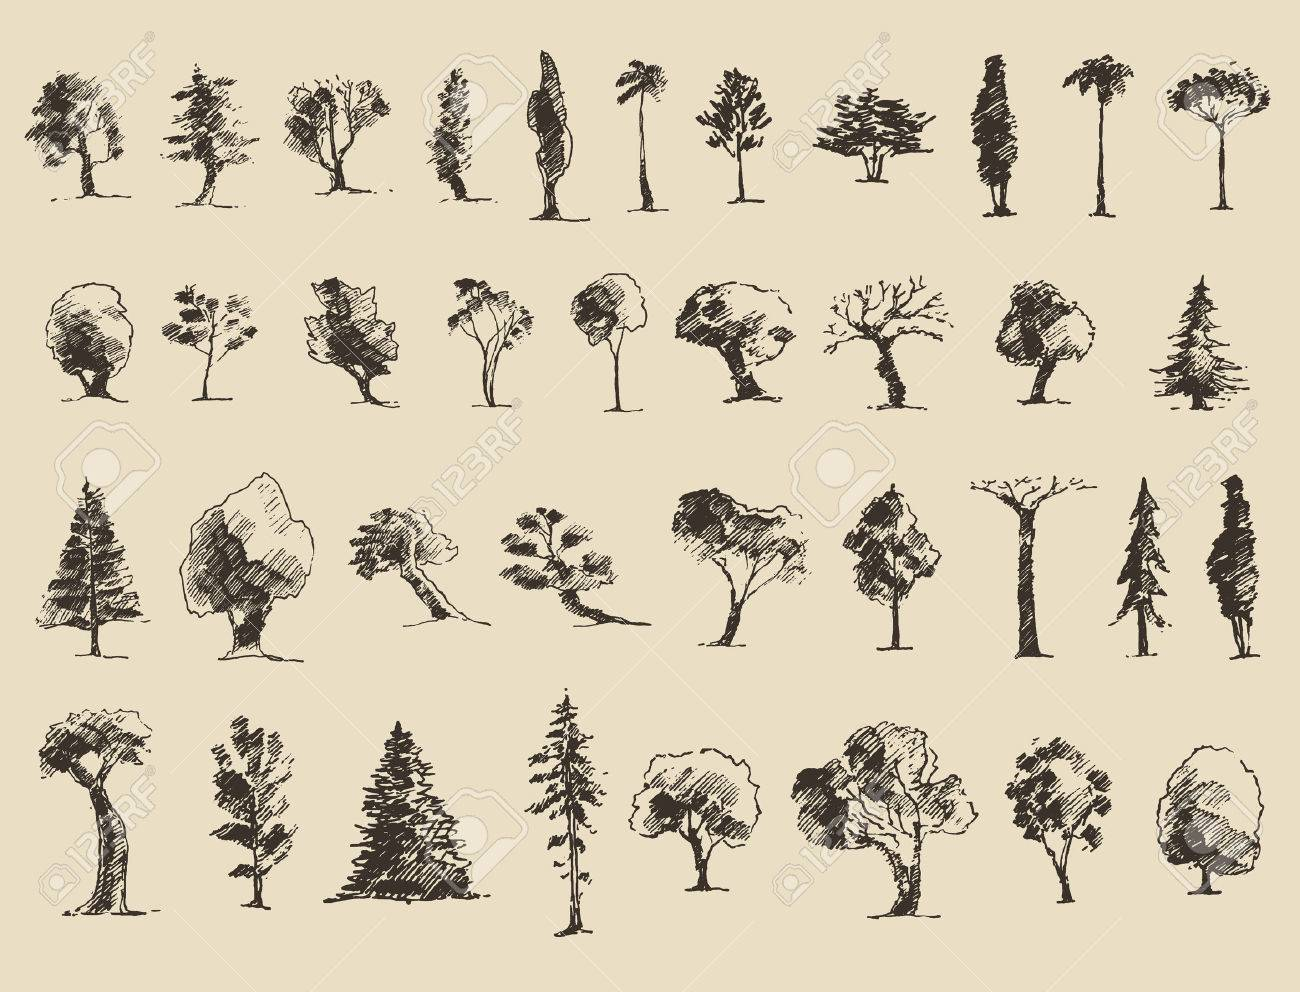 Trees sketch set vintage vector illustration engraved style trees sketch set vintage vector illustration engraved style hand drawn stock vector thecheapjerseys Gallery